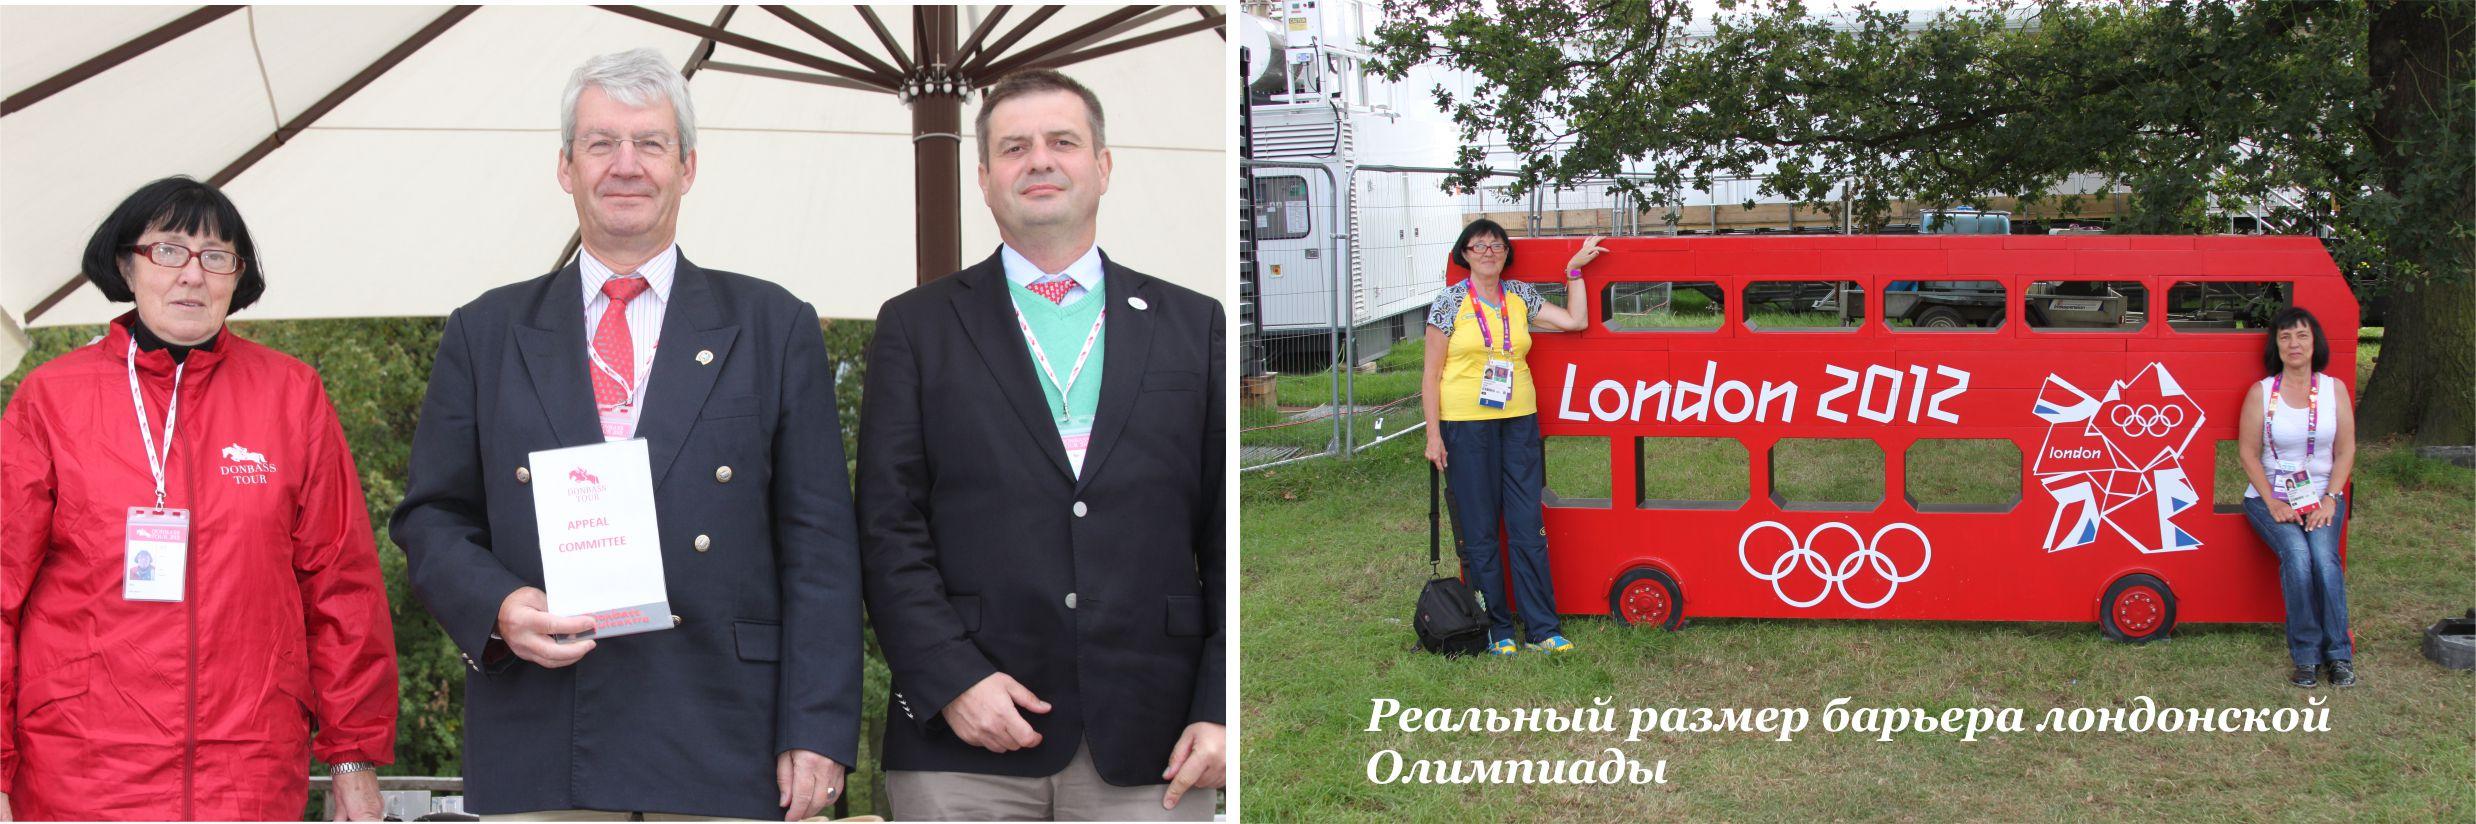 Вера Кириченко - поздравляем с юбилеем!